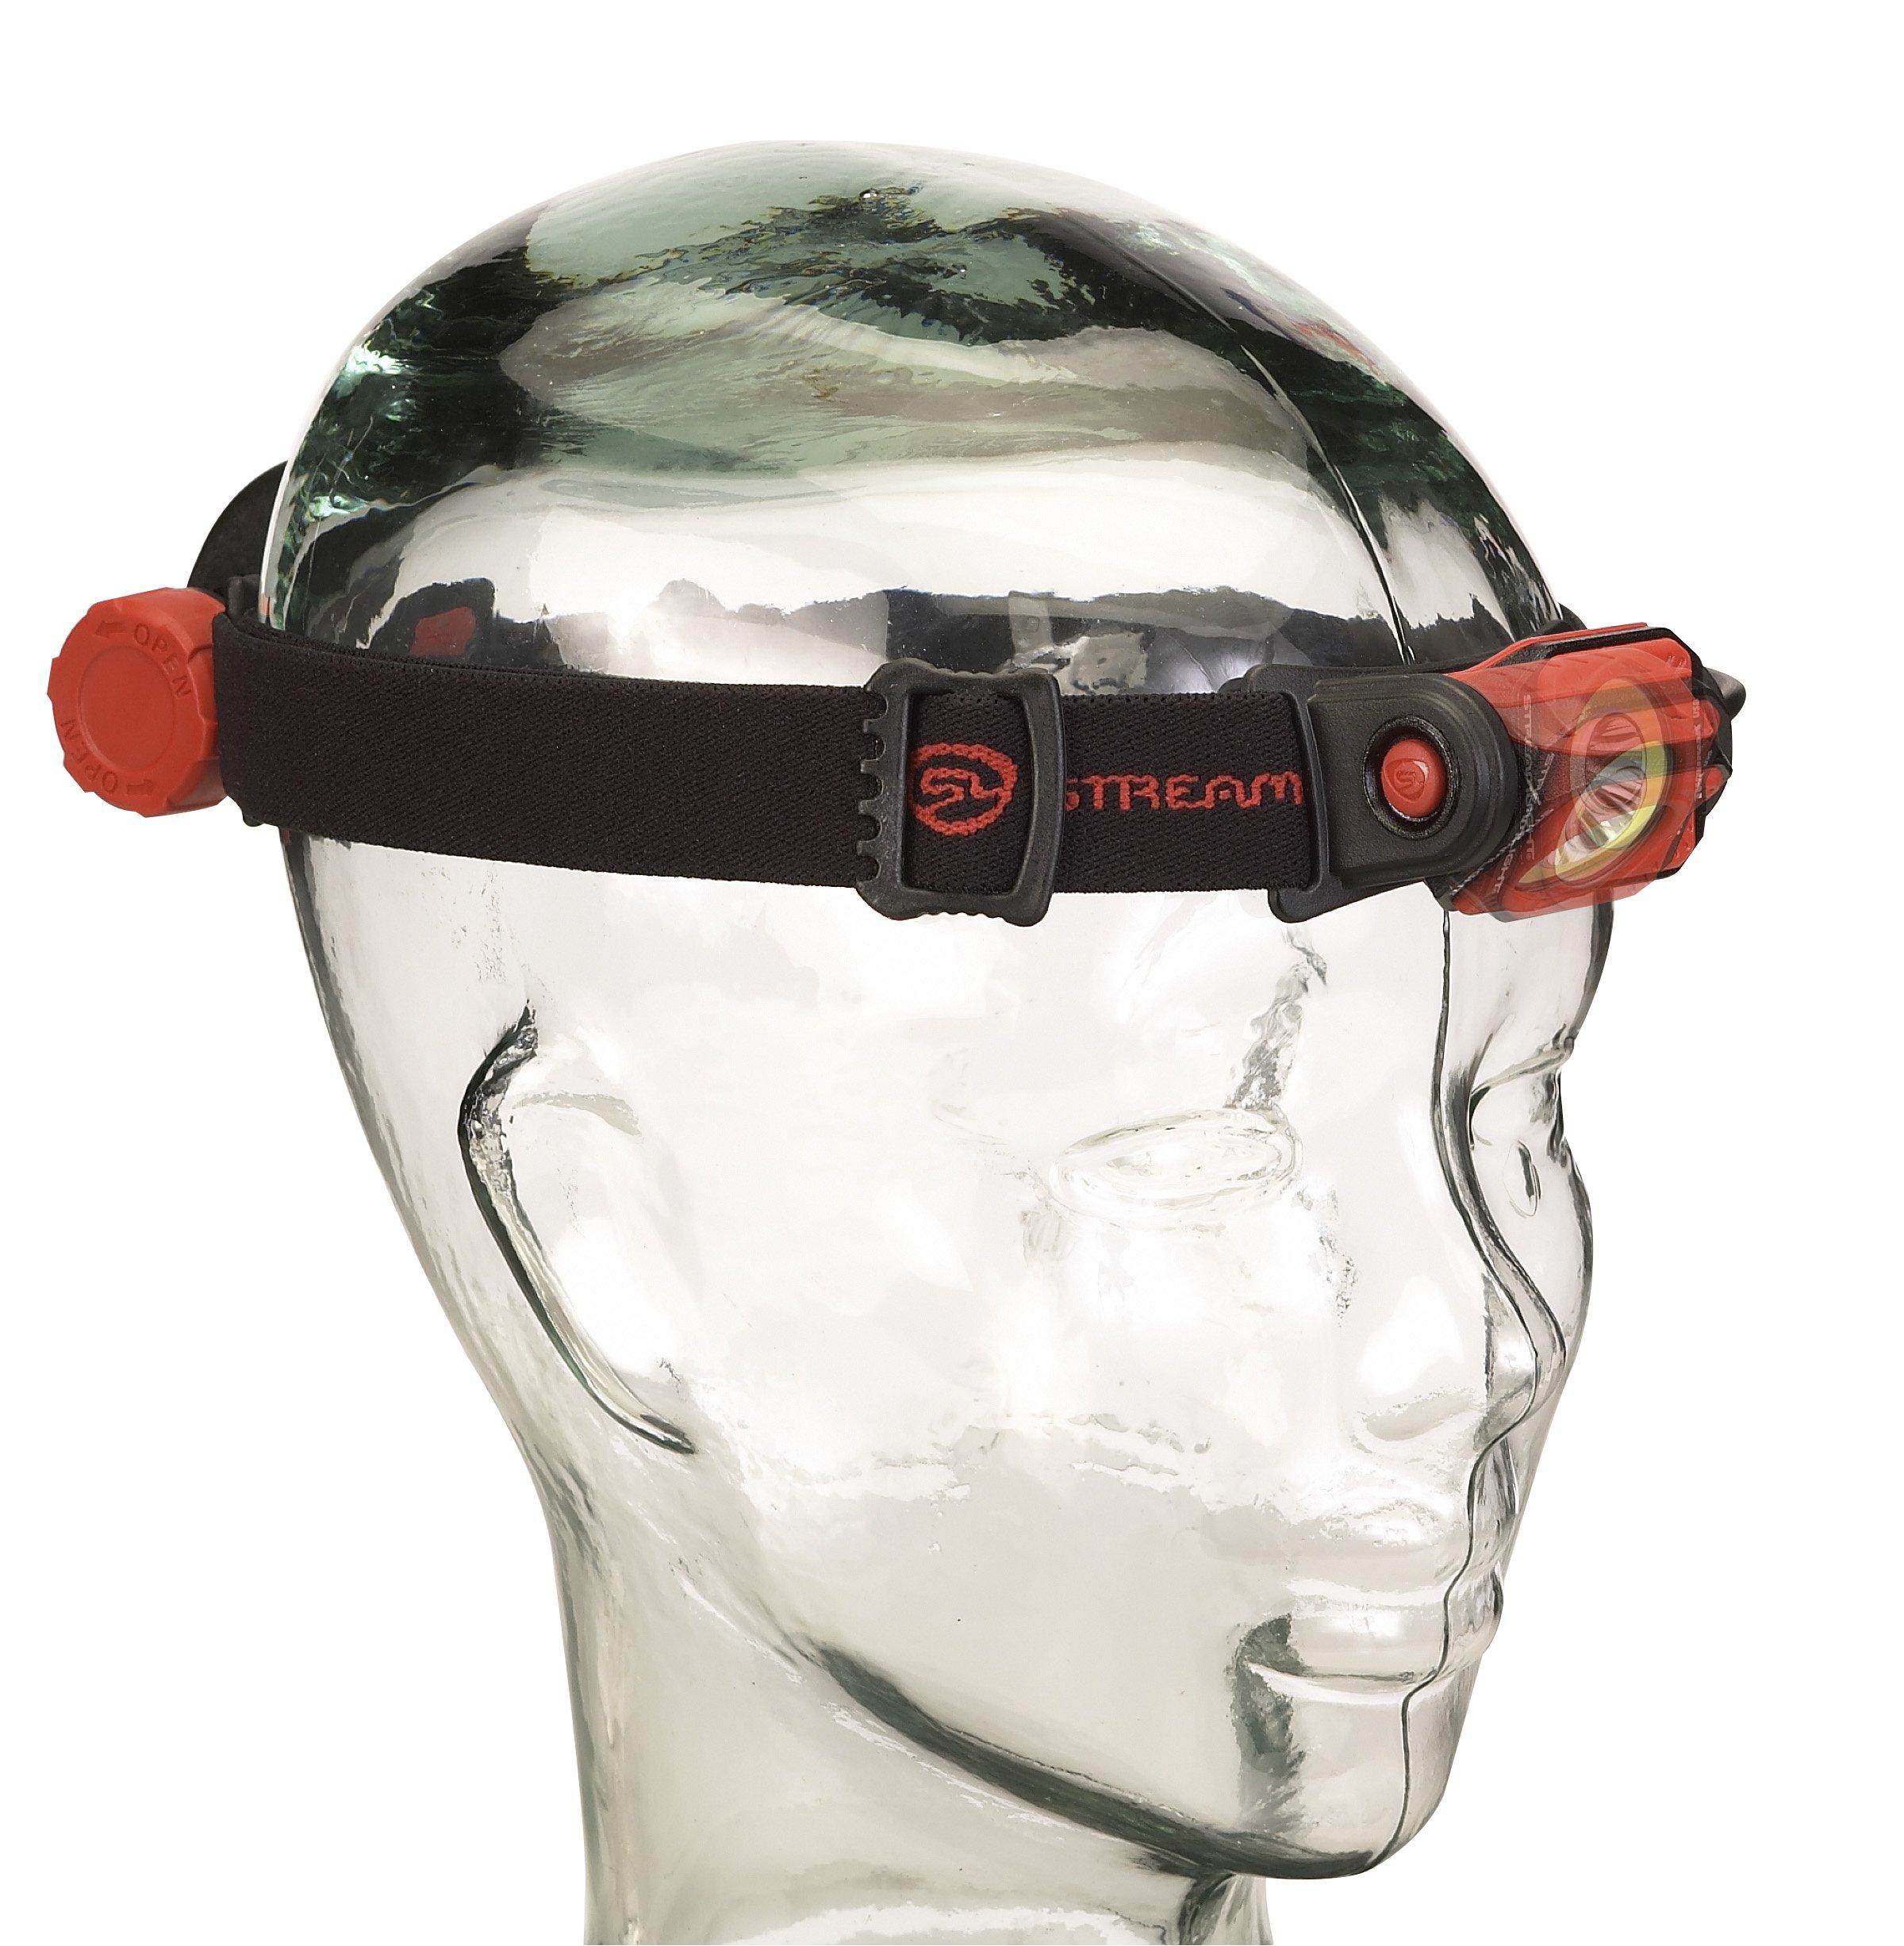 Streamlight 51064 Twin-Task USB Headlamp, Black/Red, Boxed - 375 Lumens by Streamlight